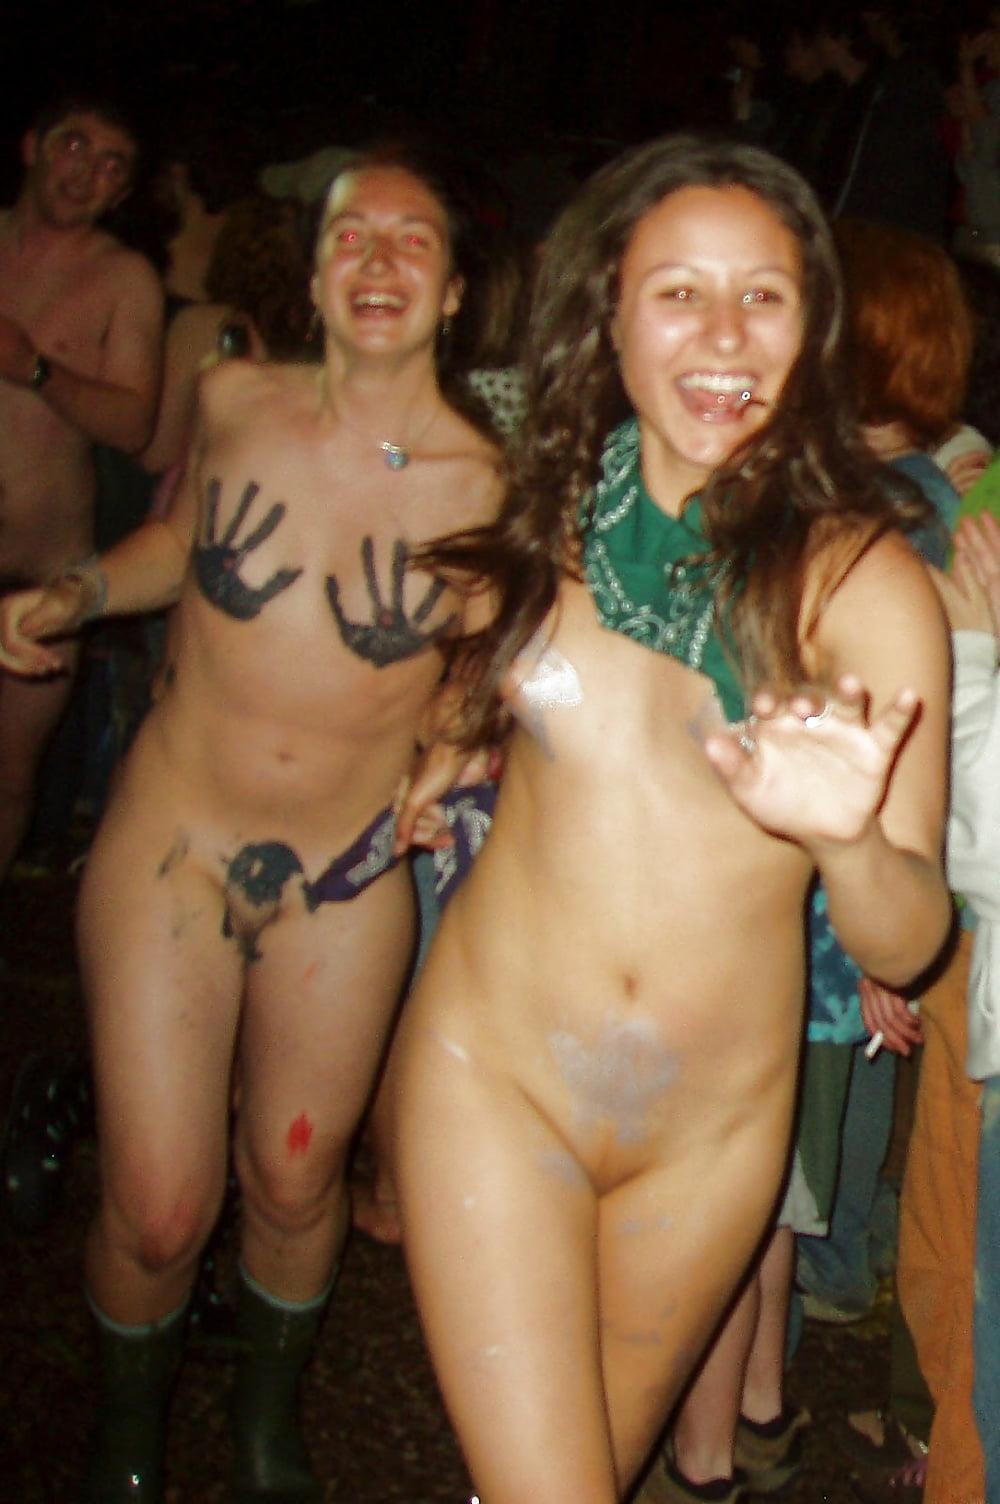 Happy embarrassed girls porn photos